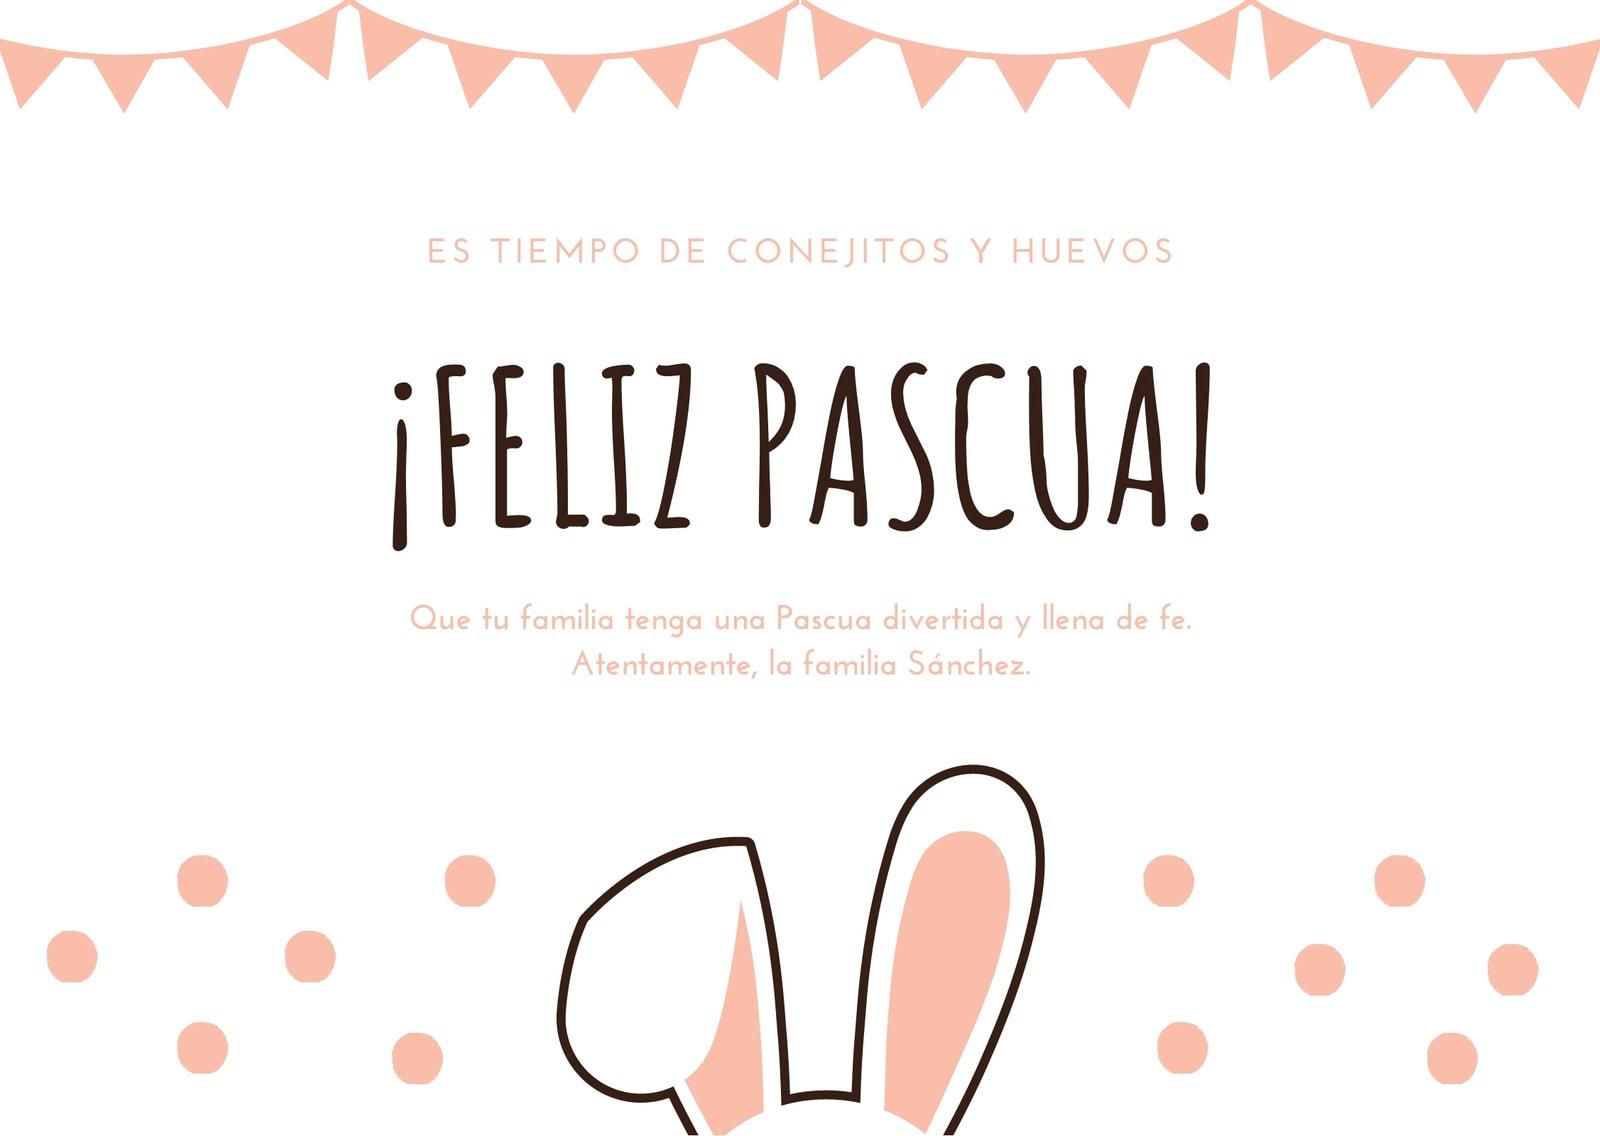 Rosa Conejo Puntos Lunares Pascua Tarjeta